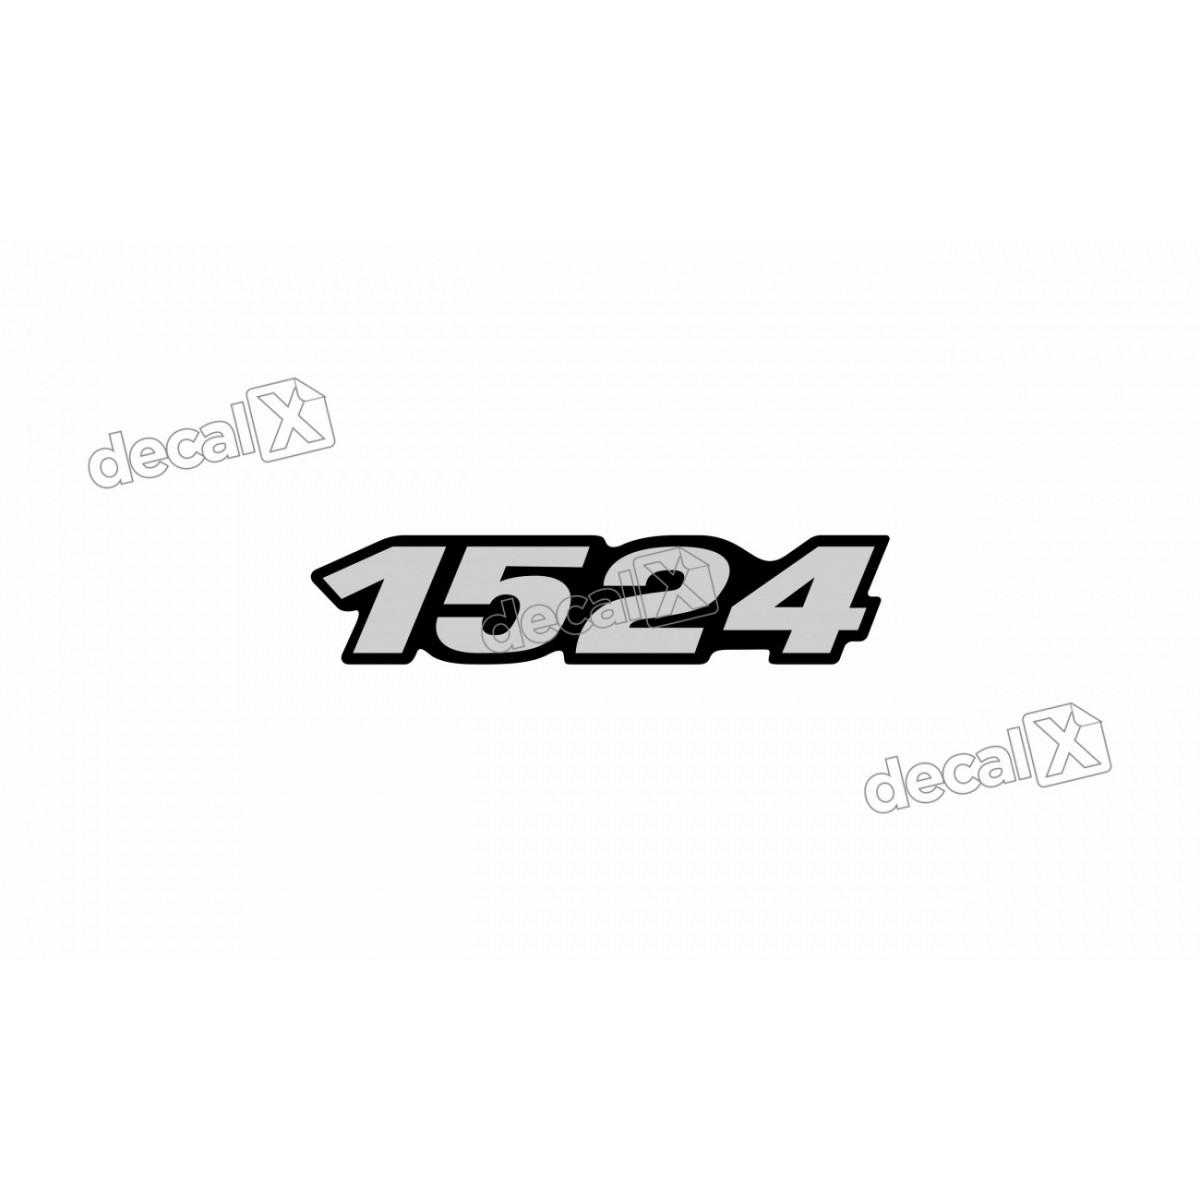 Adesivo Emblema Resinado Mercedes 1524 Cm40 Decalx